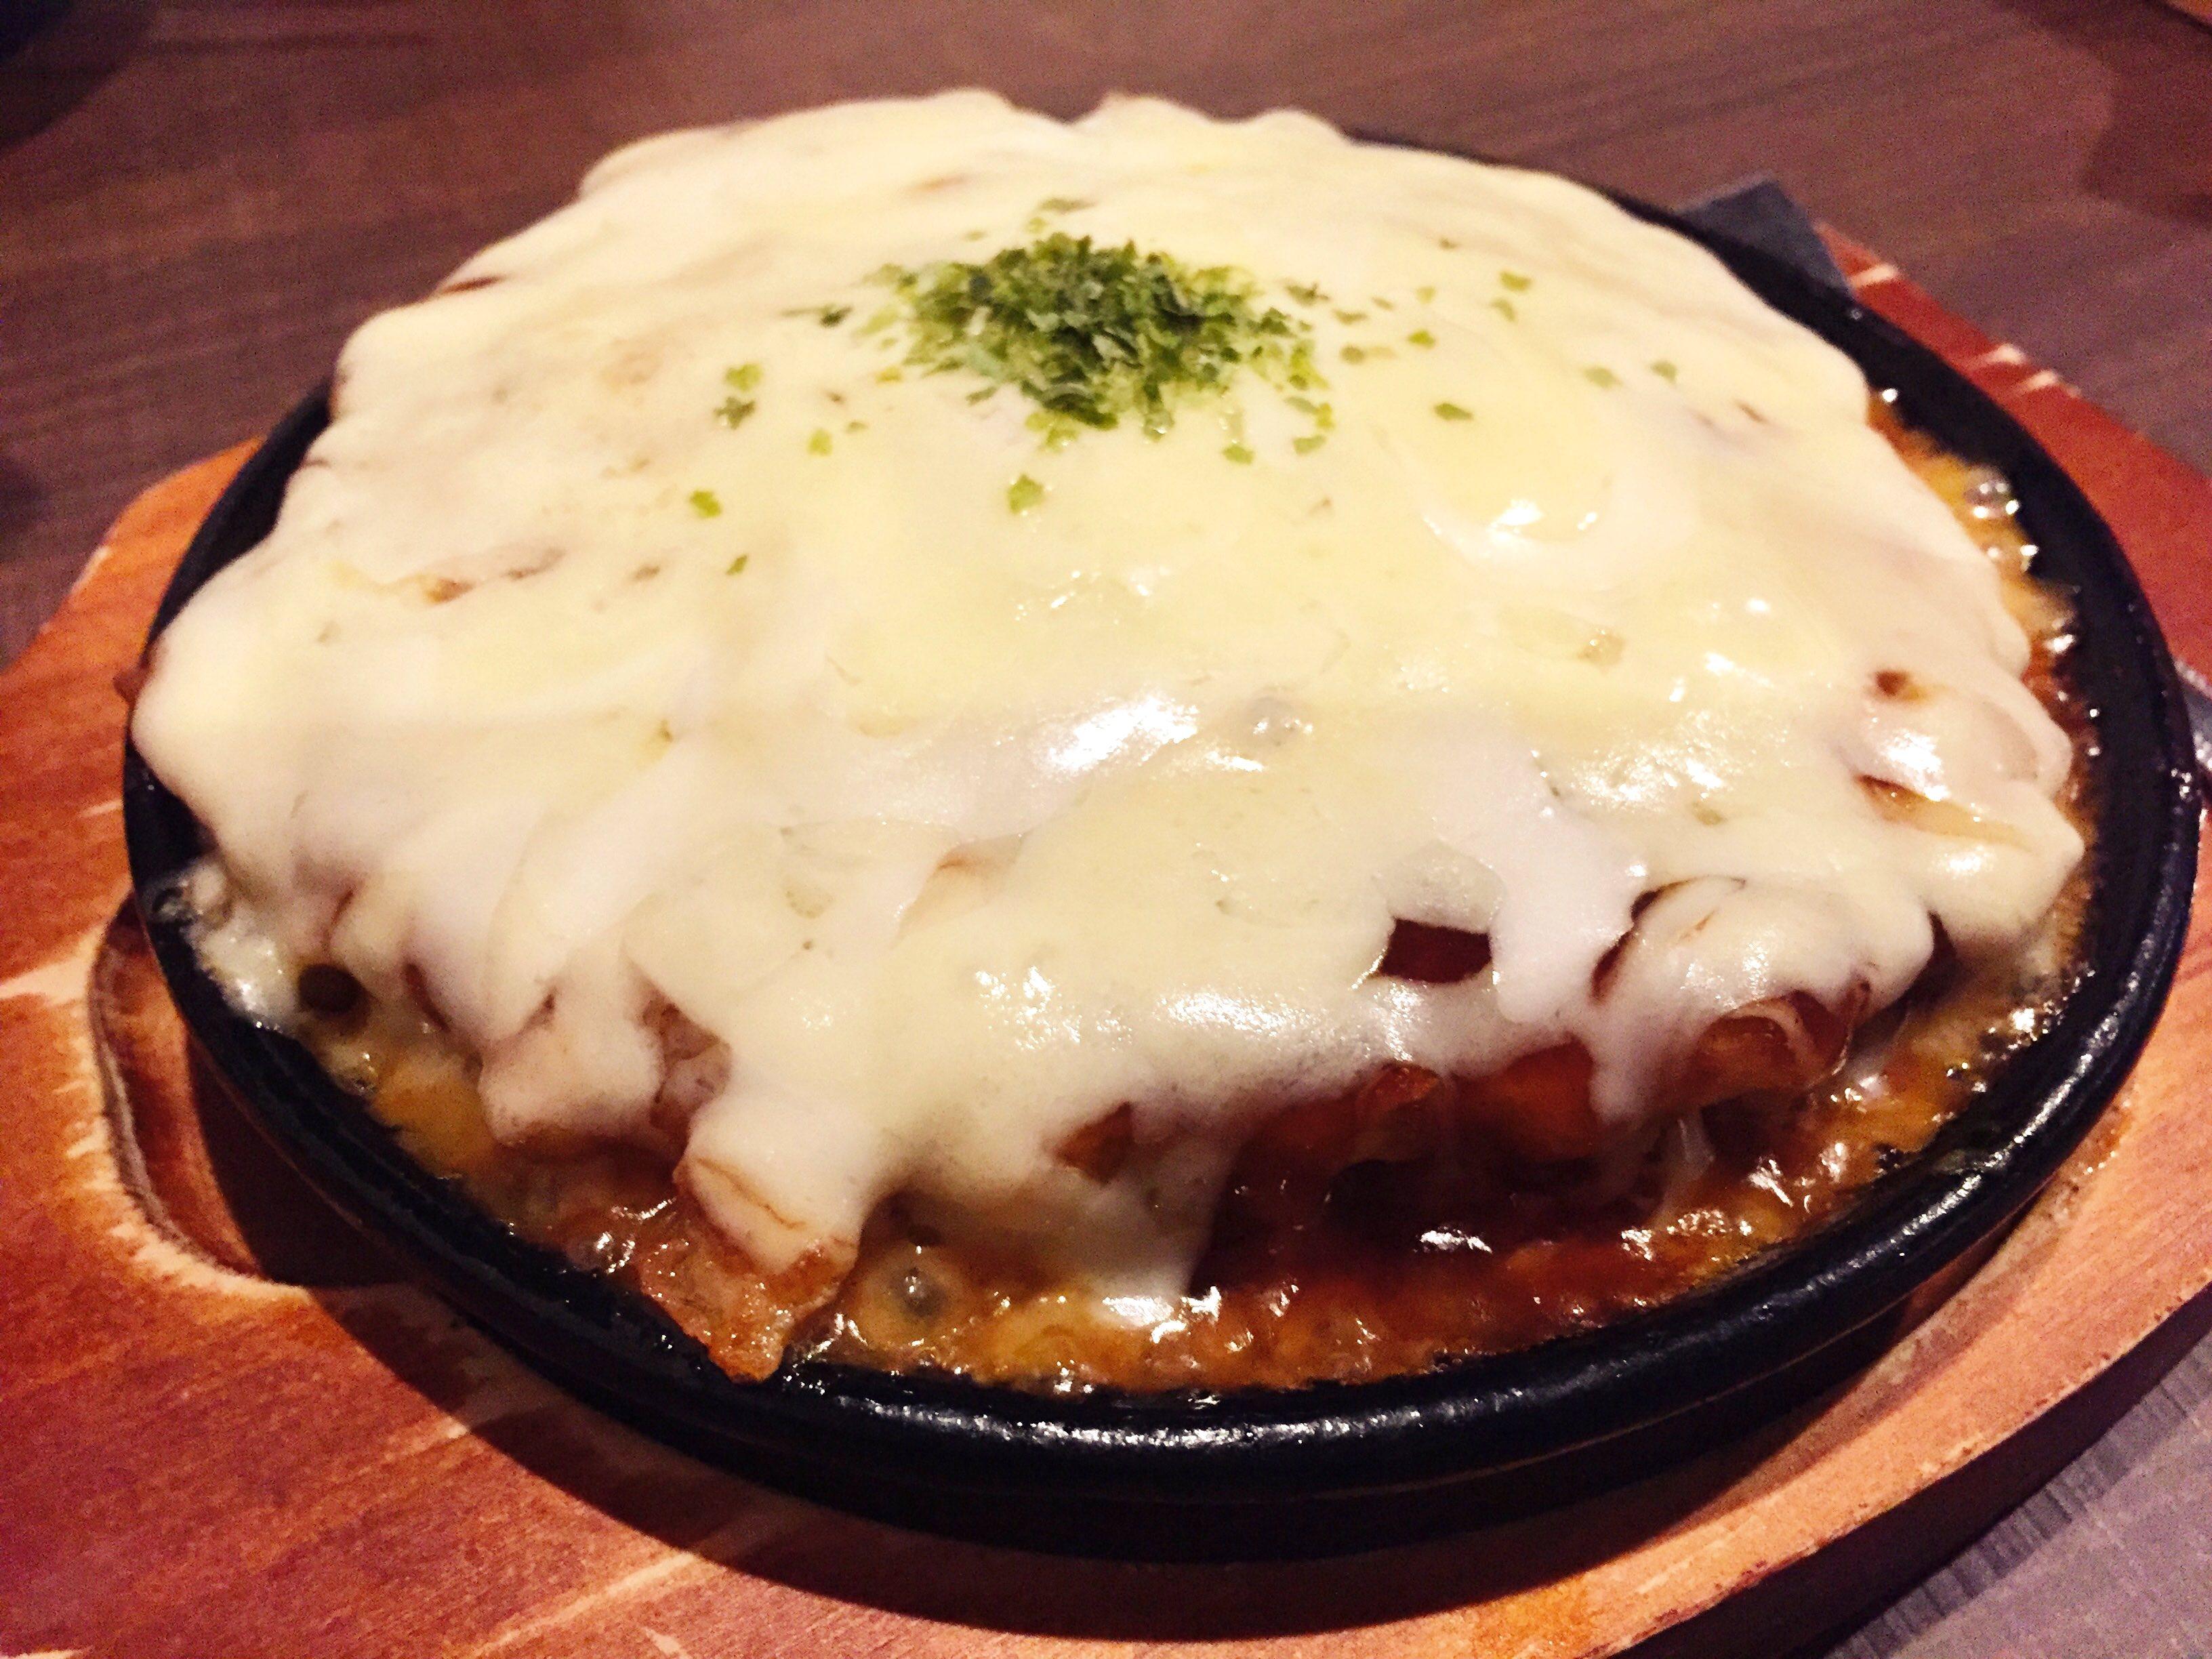 Jeroのお好み焼きチーズ入り